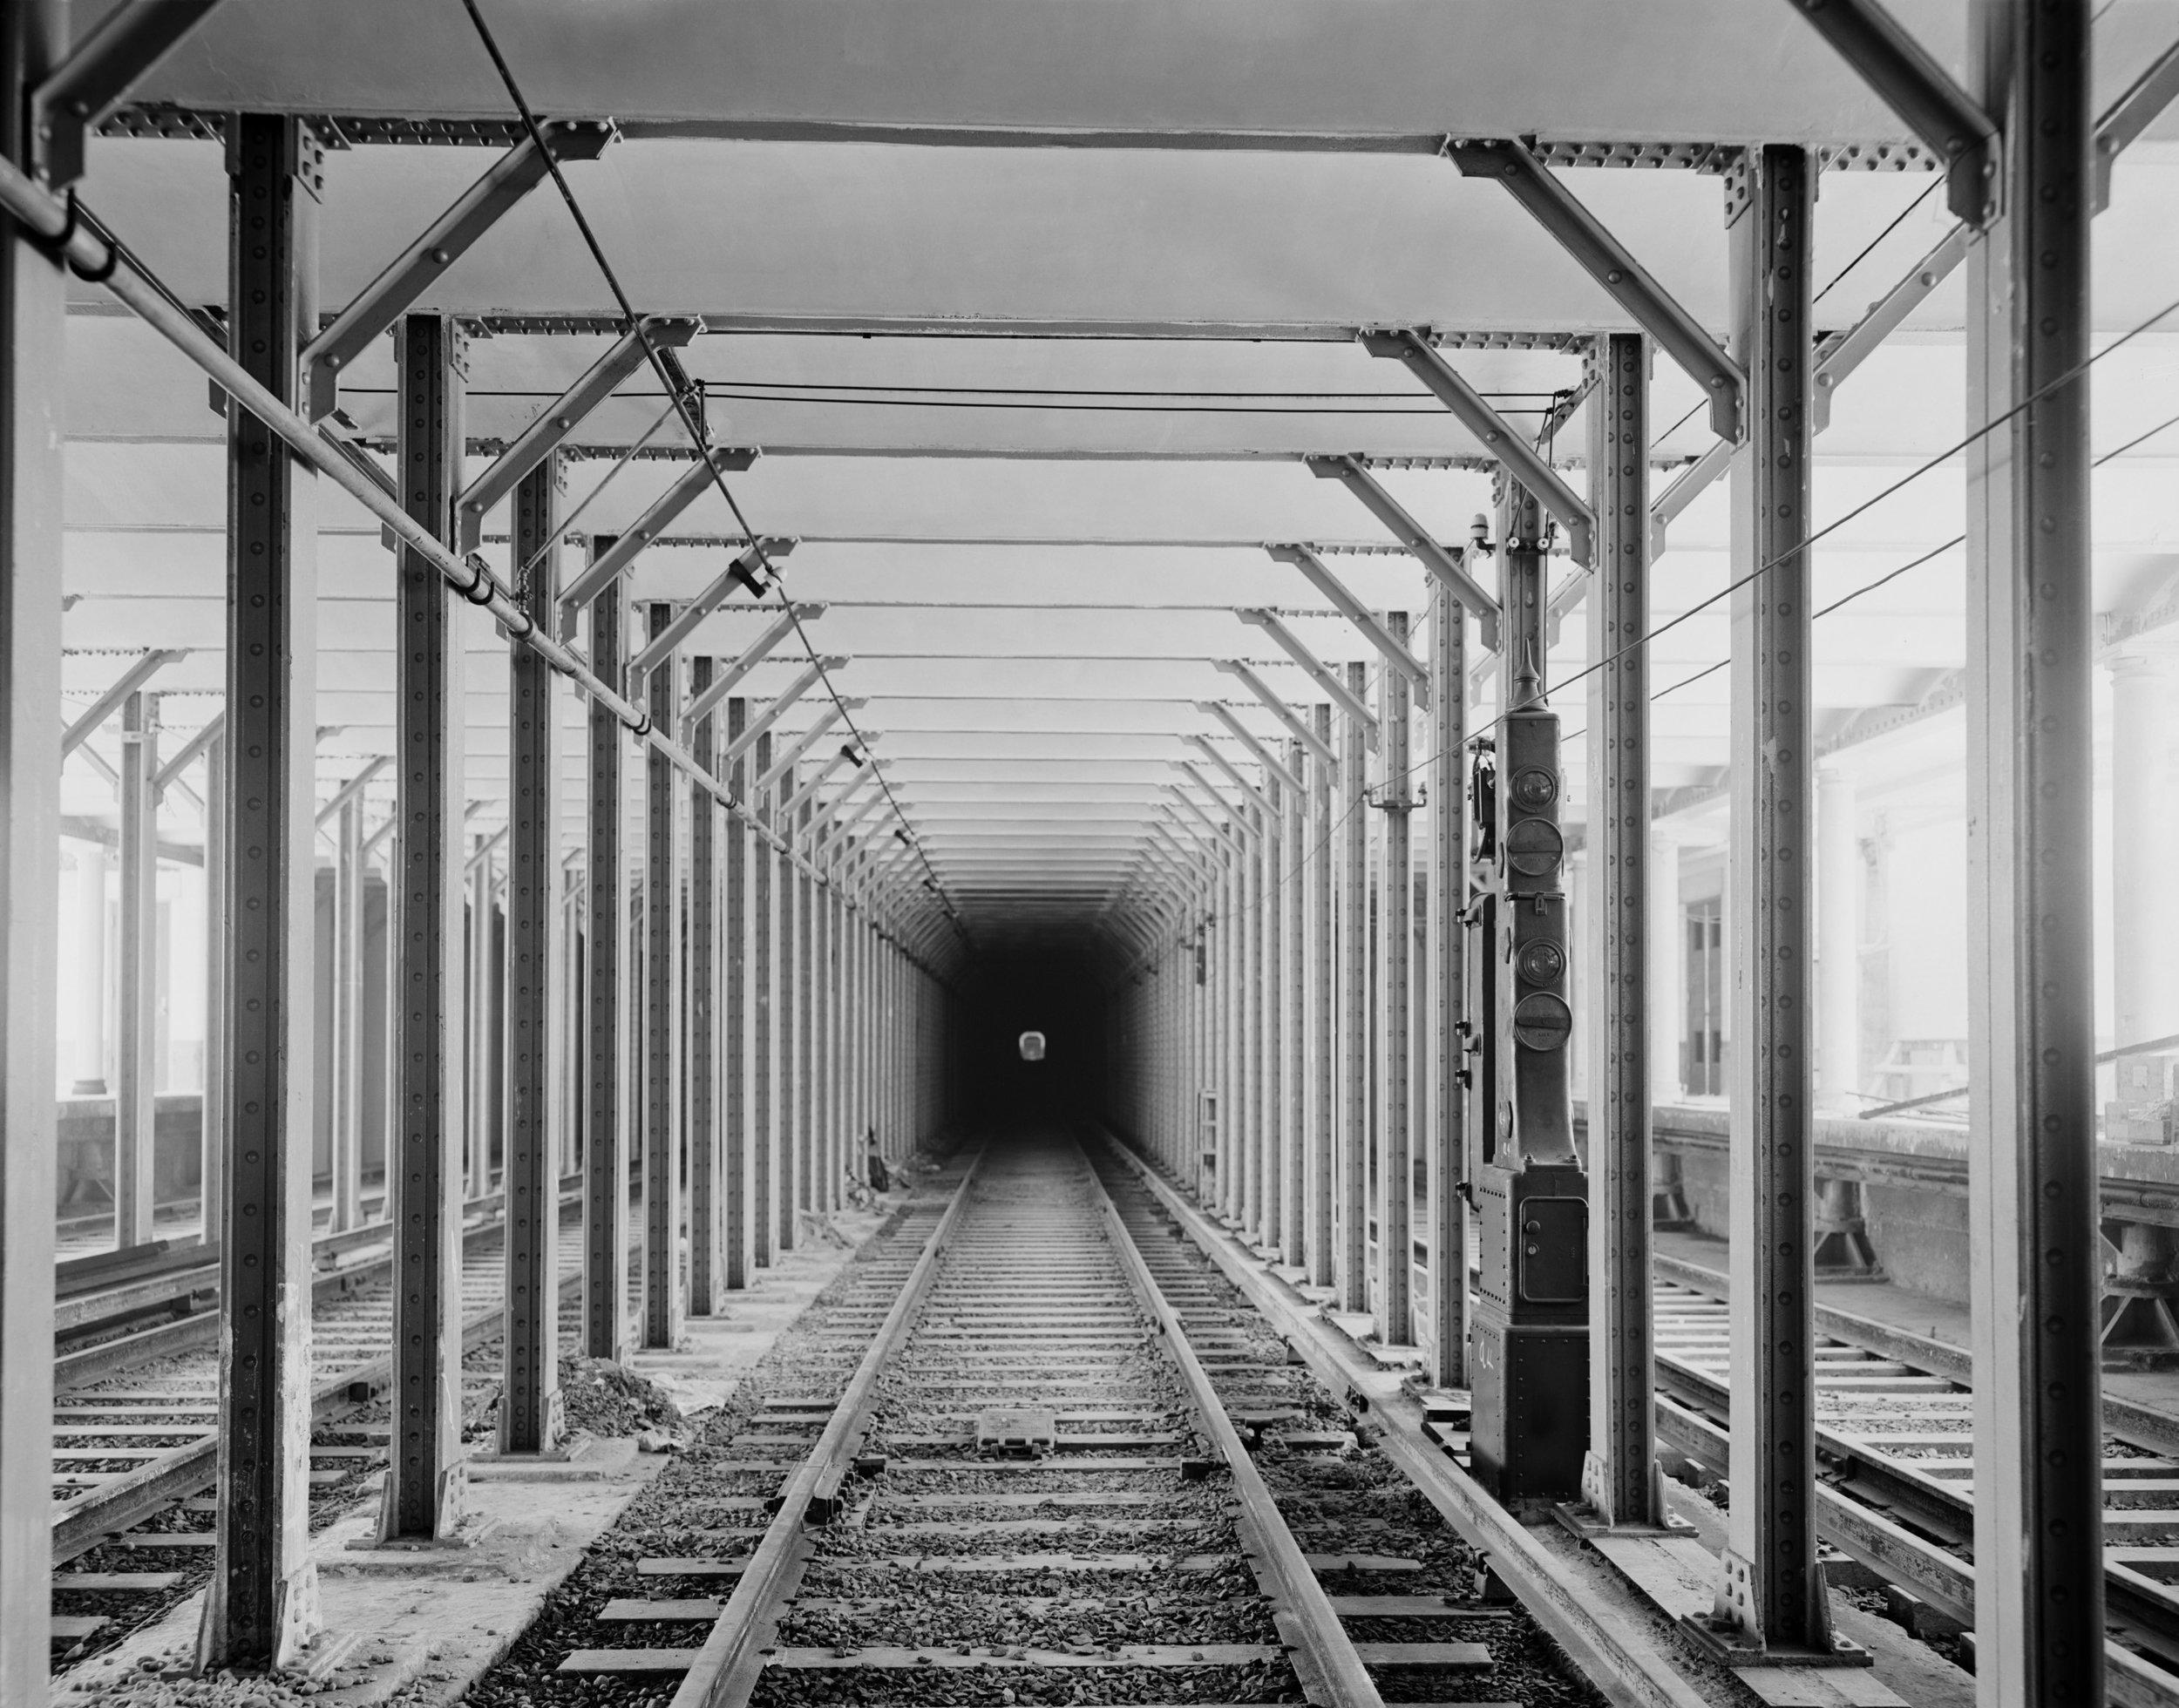 New York subway tracks and tunnel